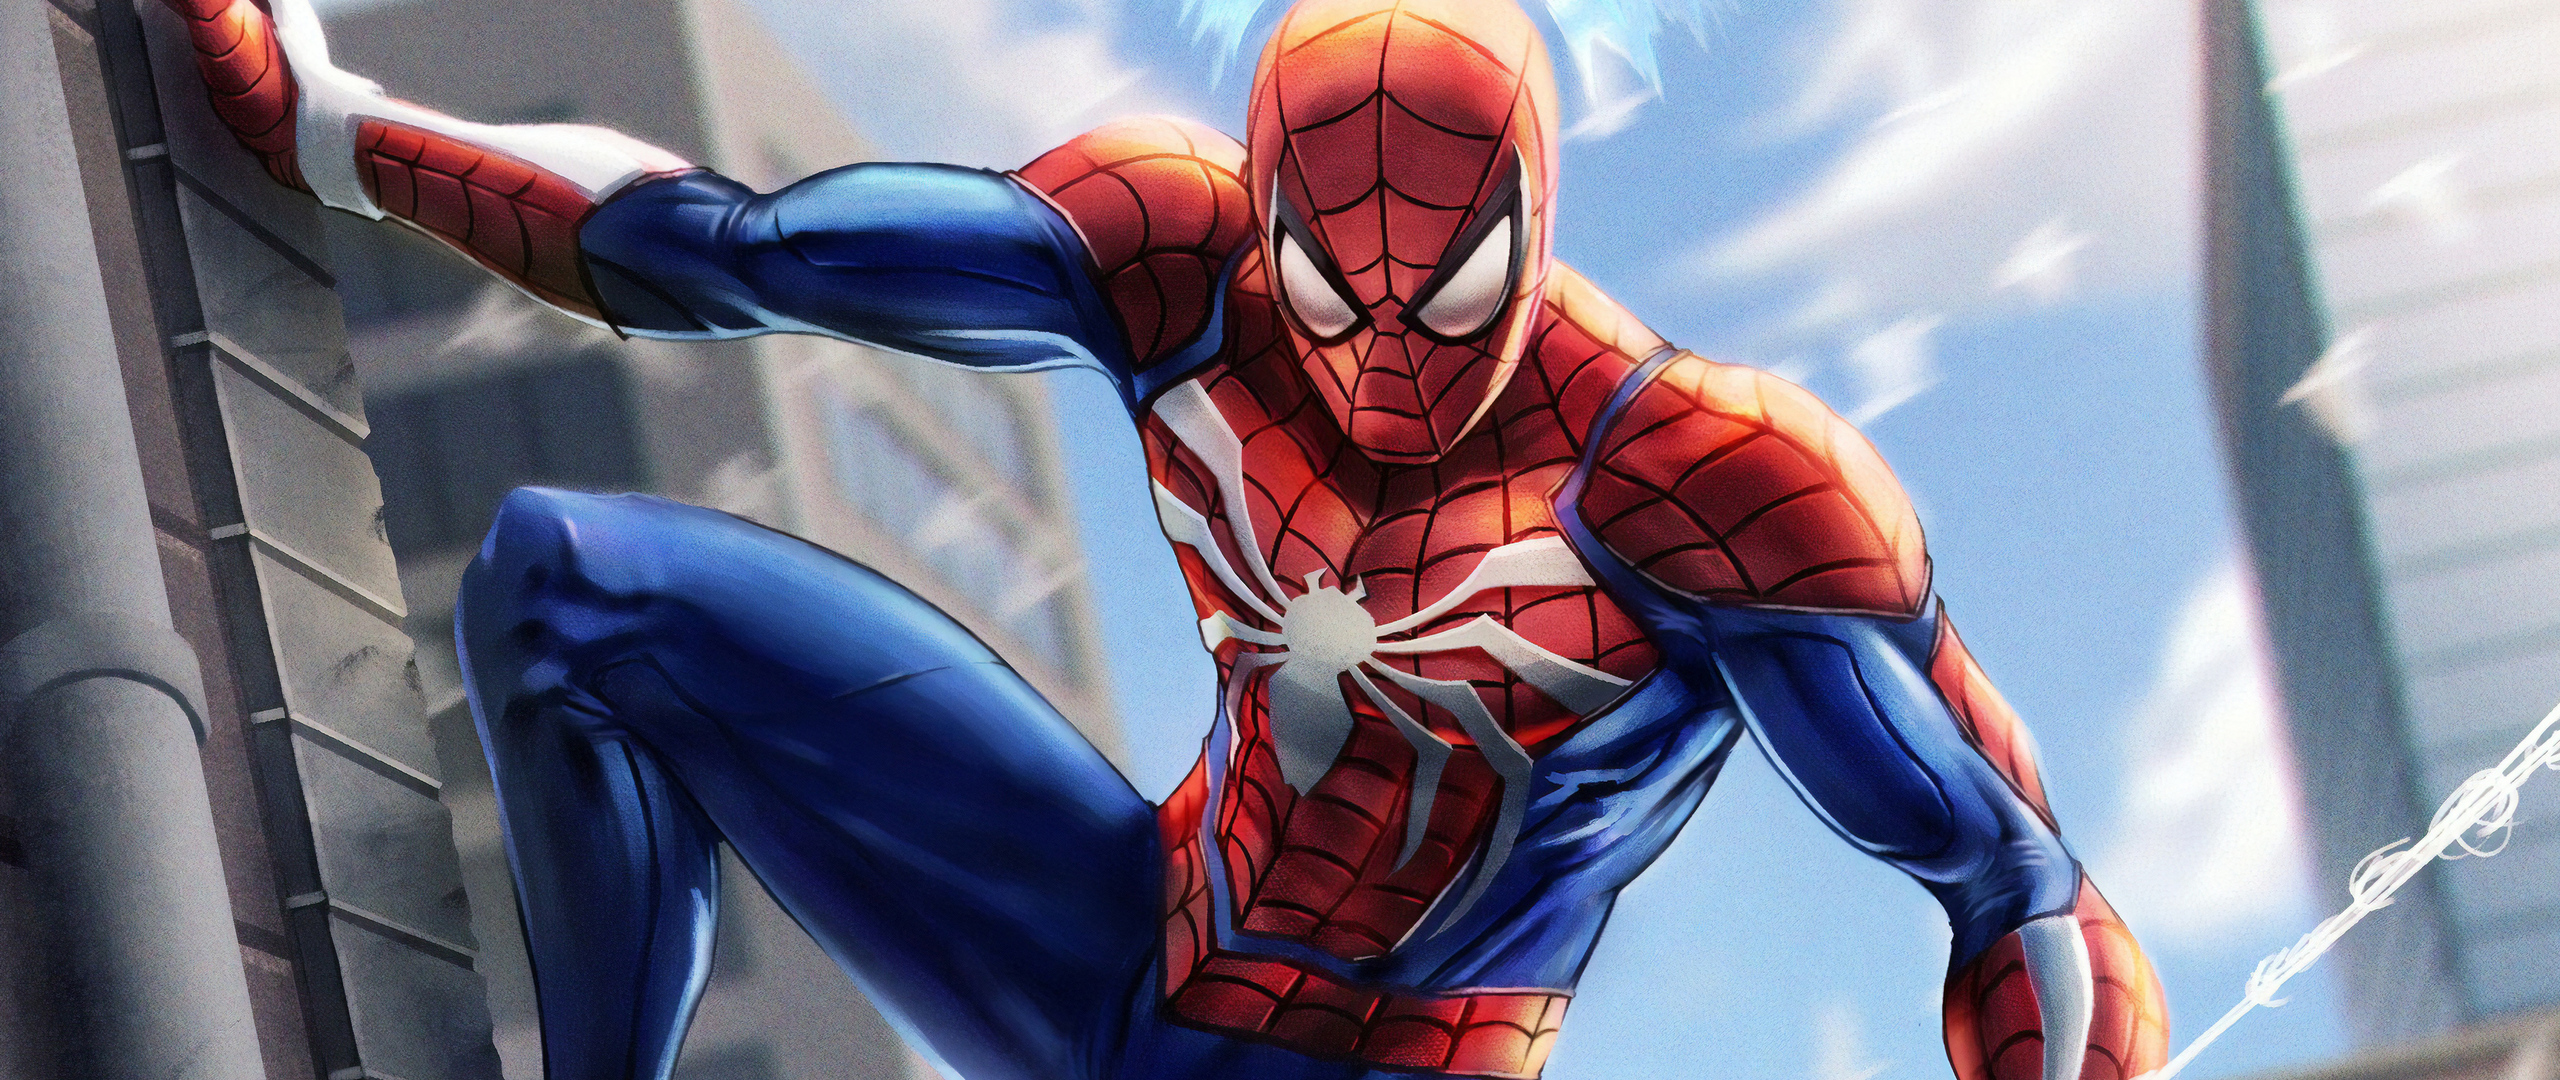 spiderman-paint-art-6p.jpg